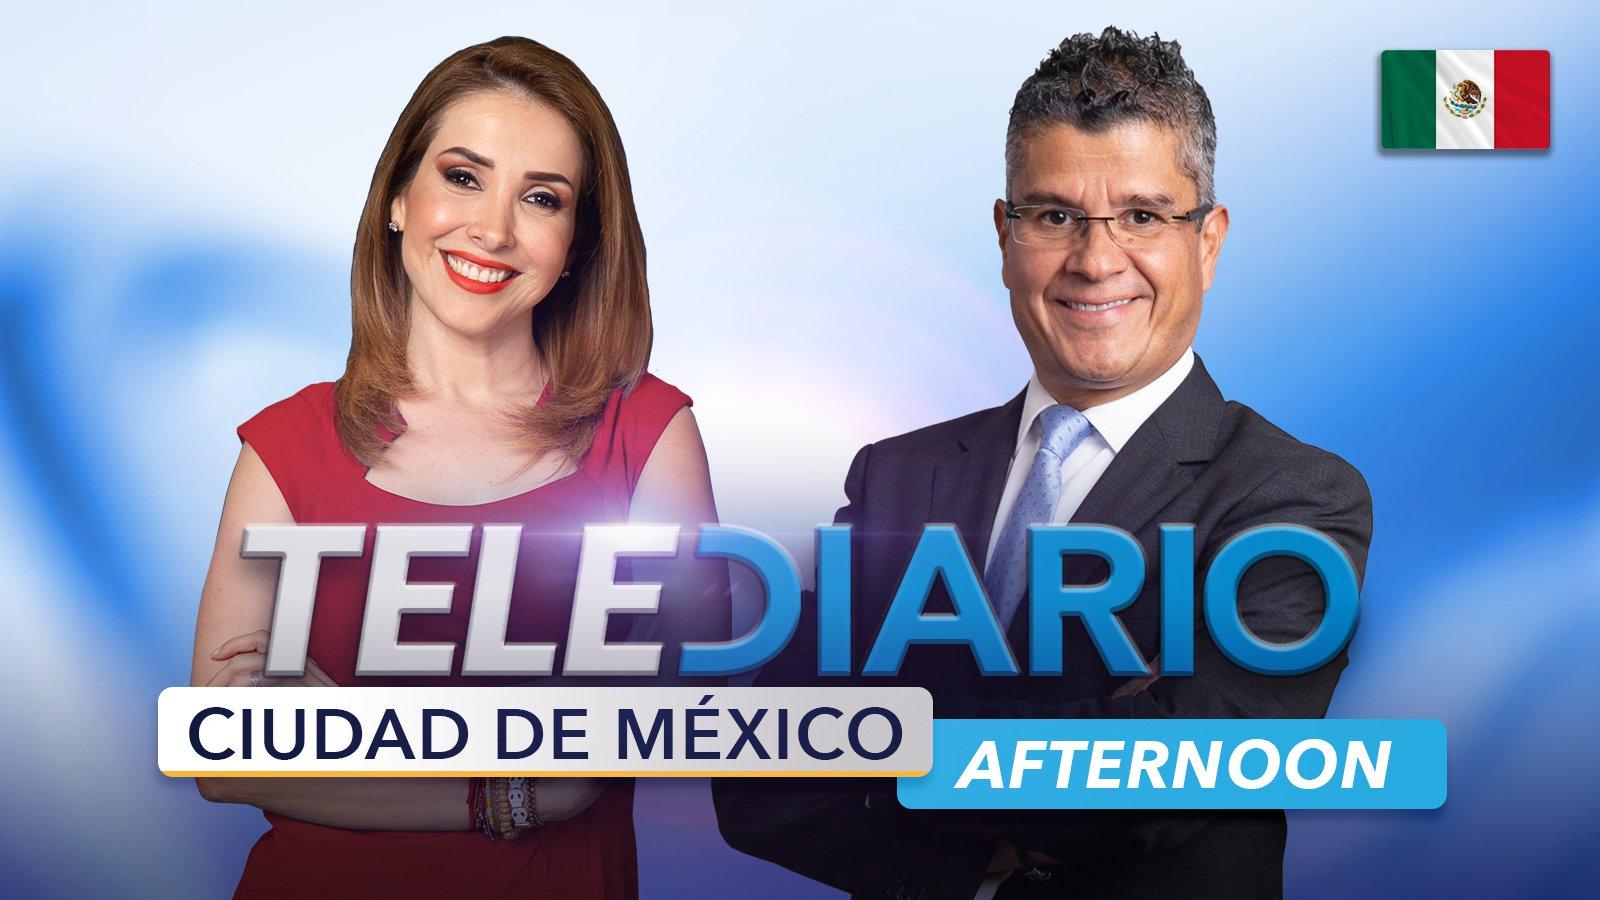 Afternoon CDMX Telediario poster